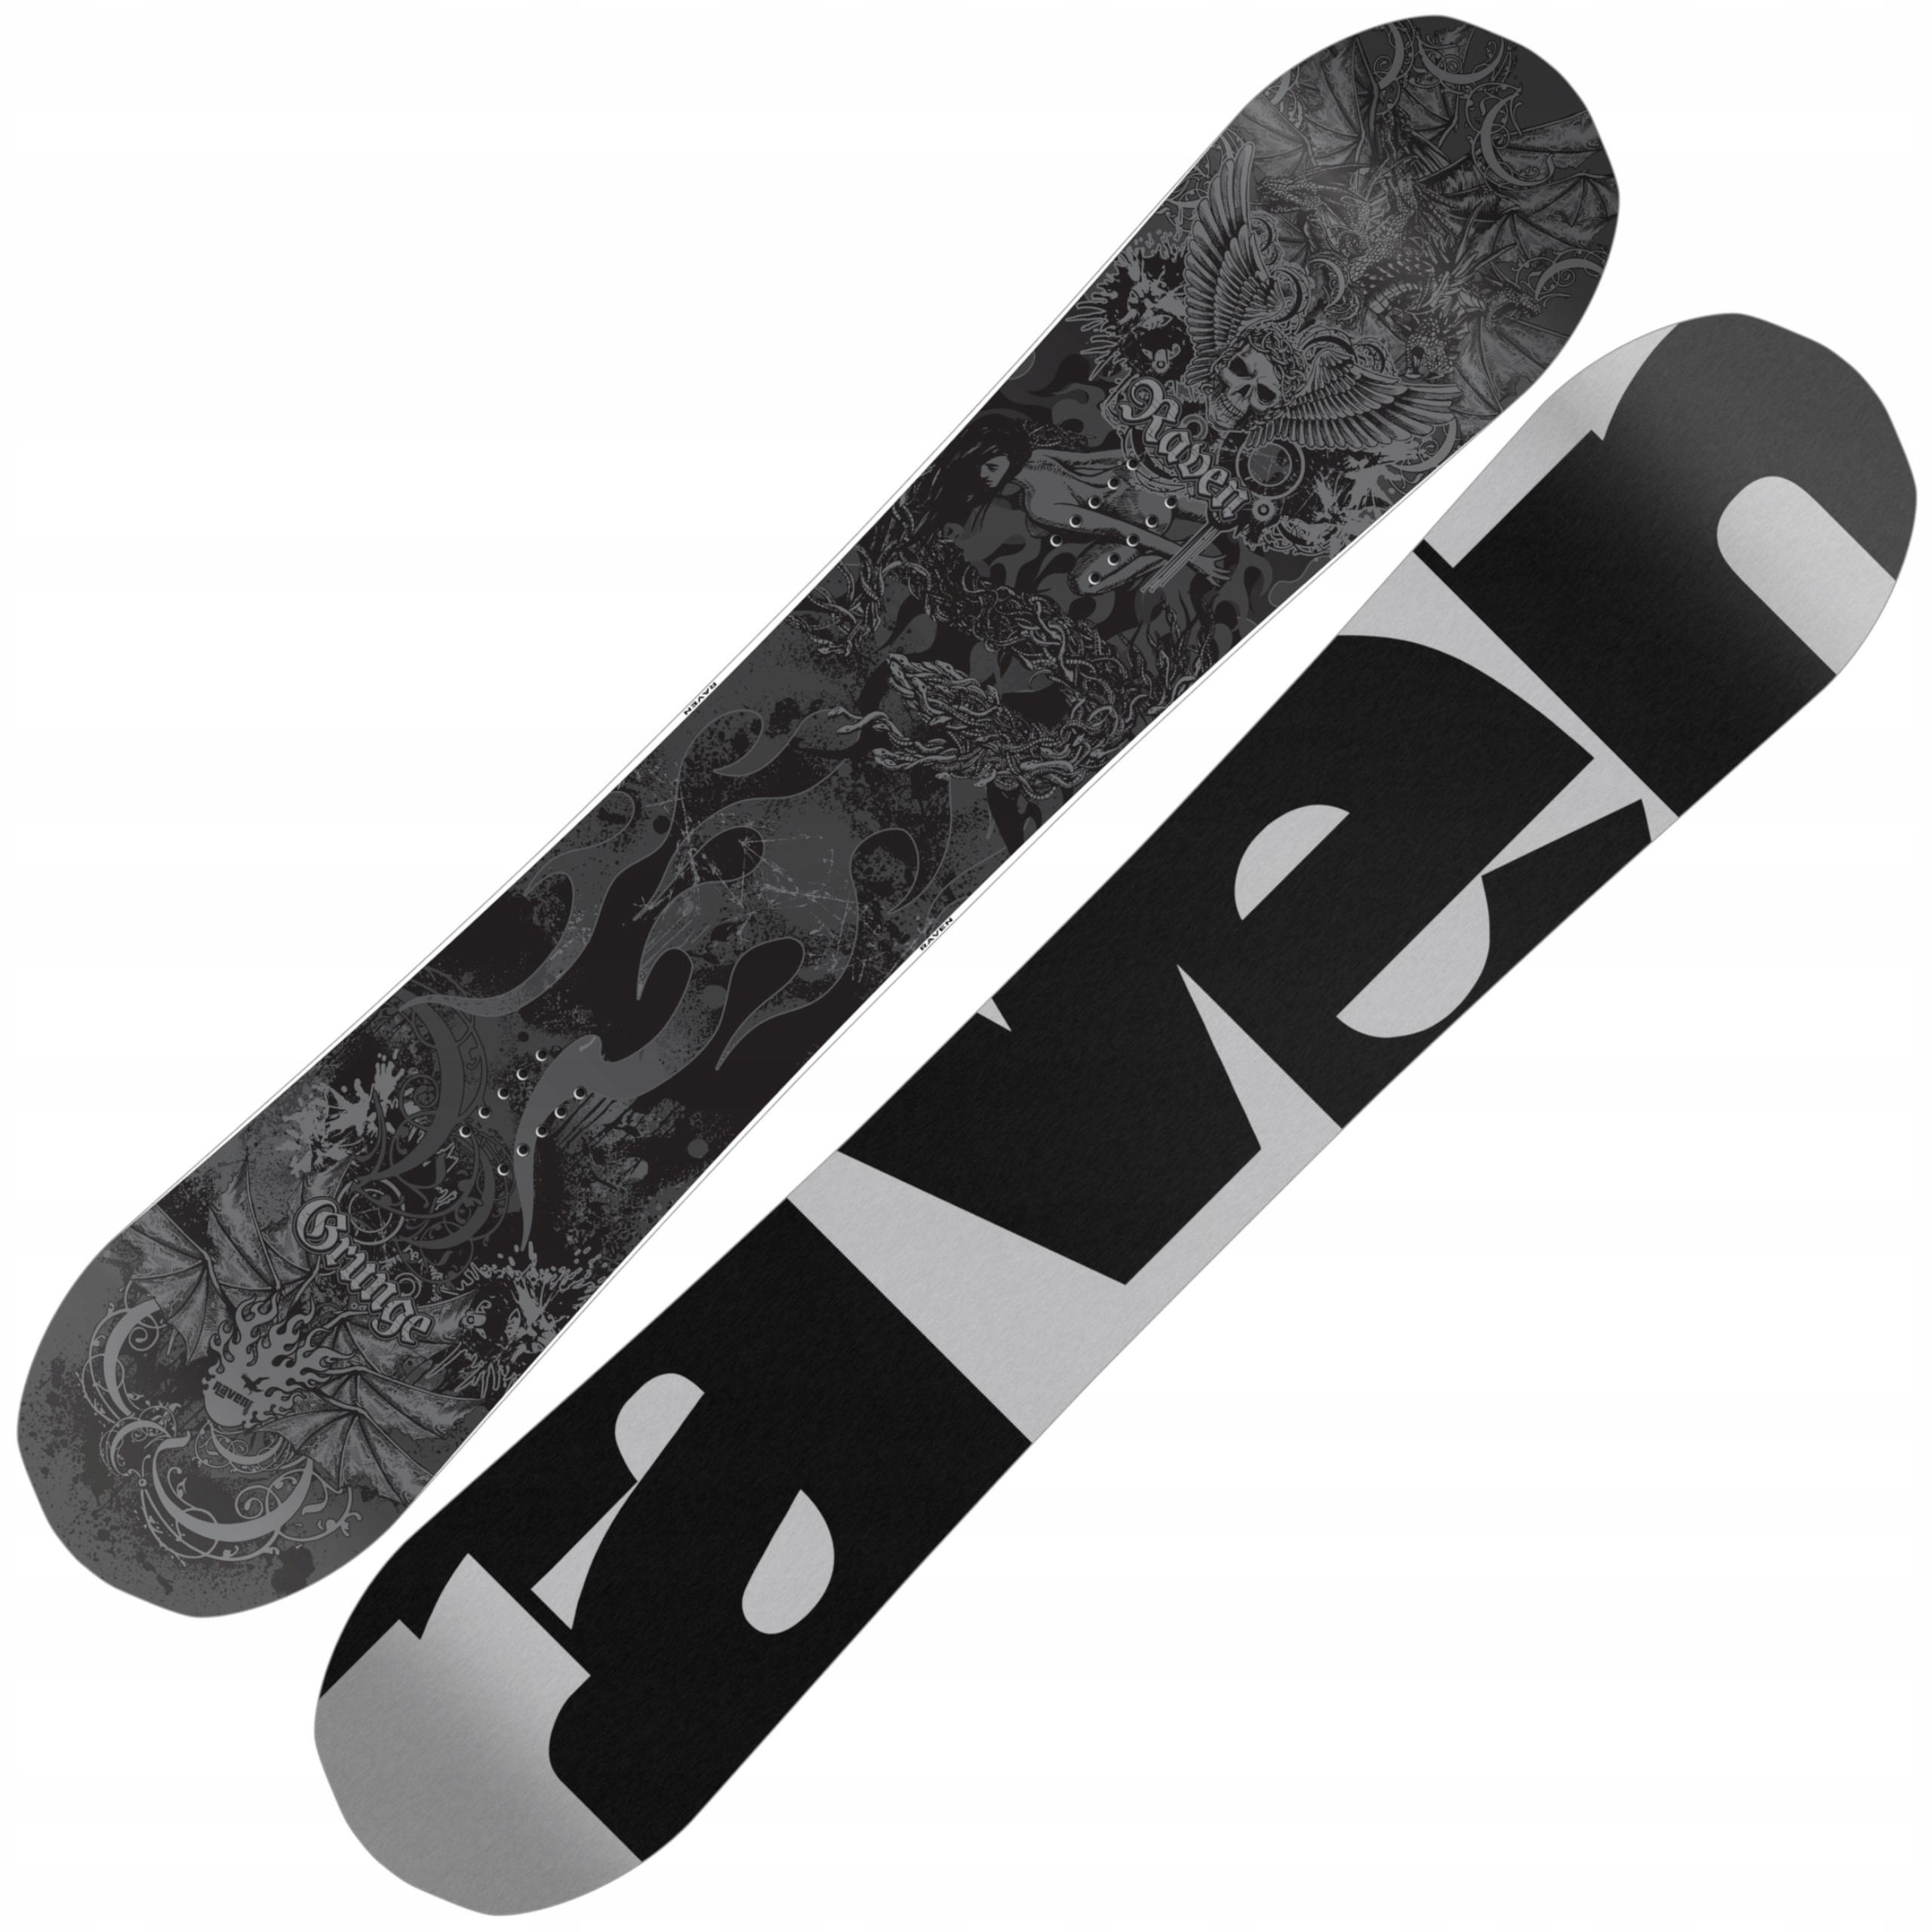 RAVEN snowboard Grunge 162 cm Polovice Široký 2019